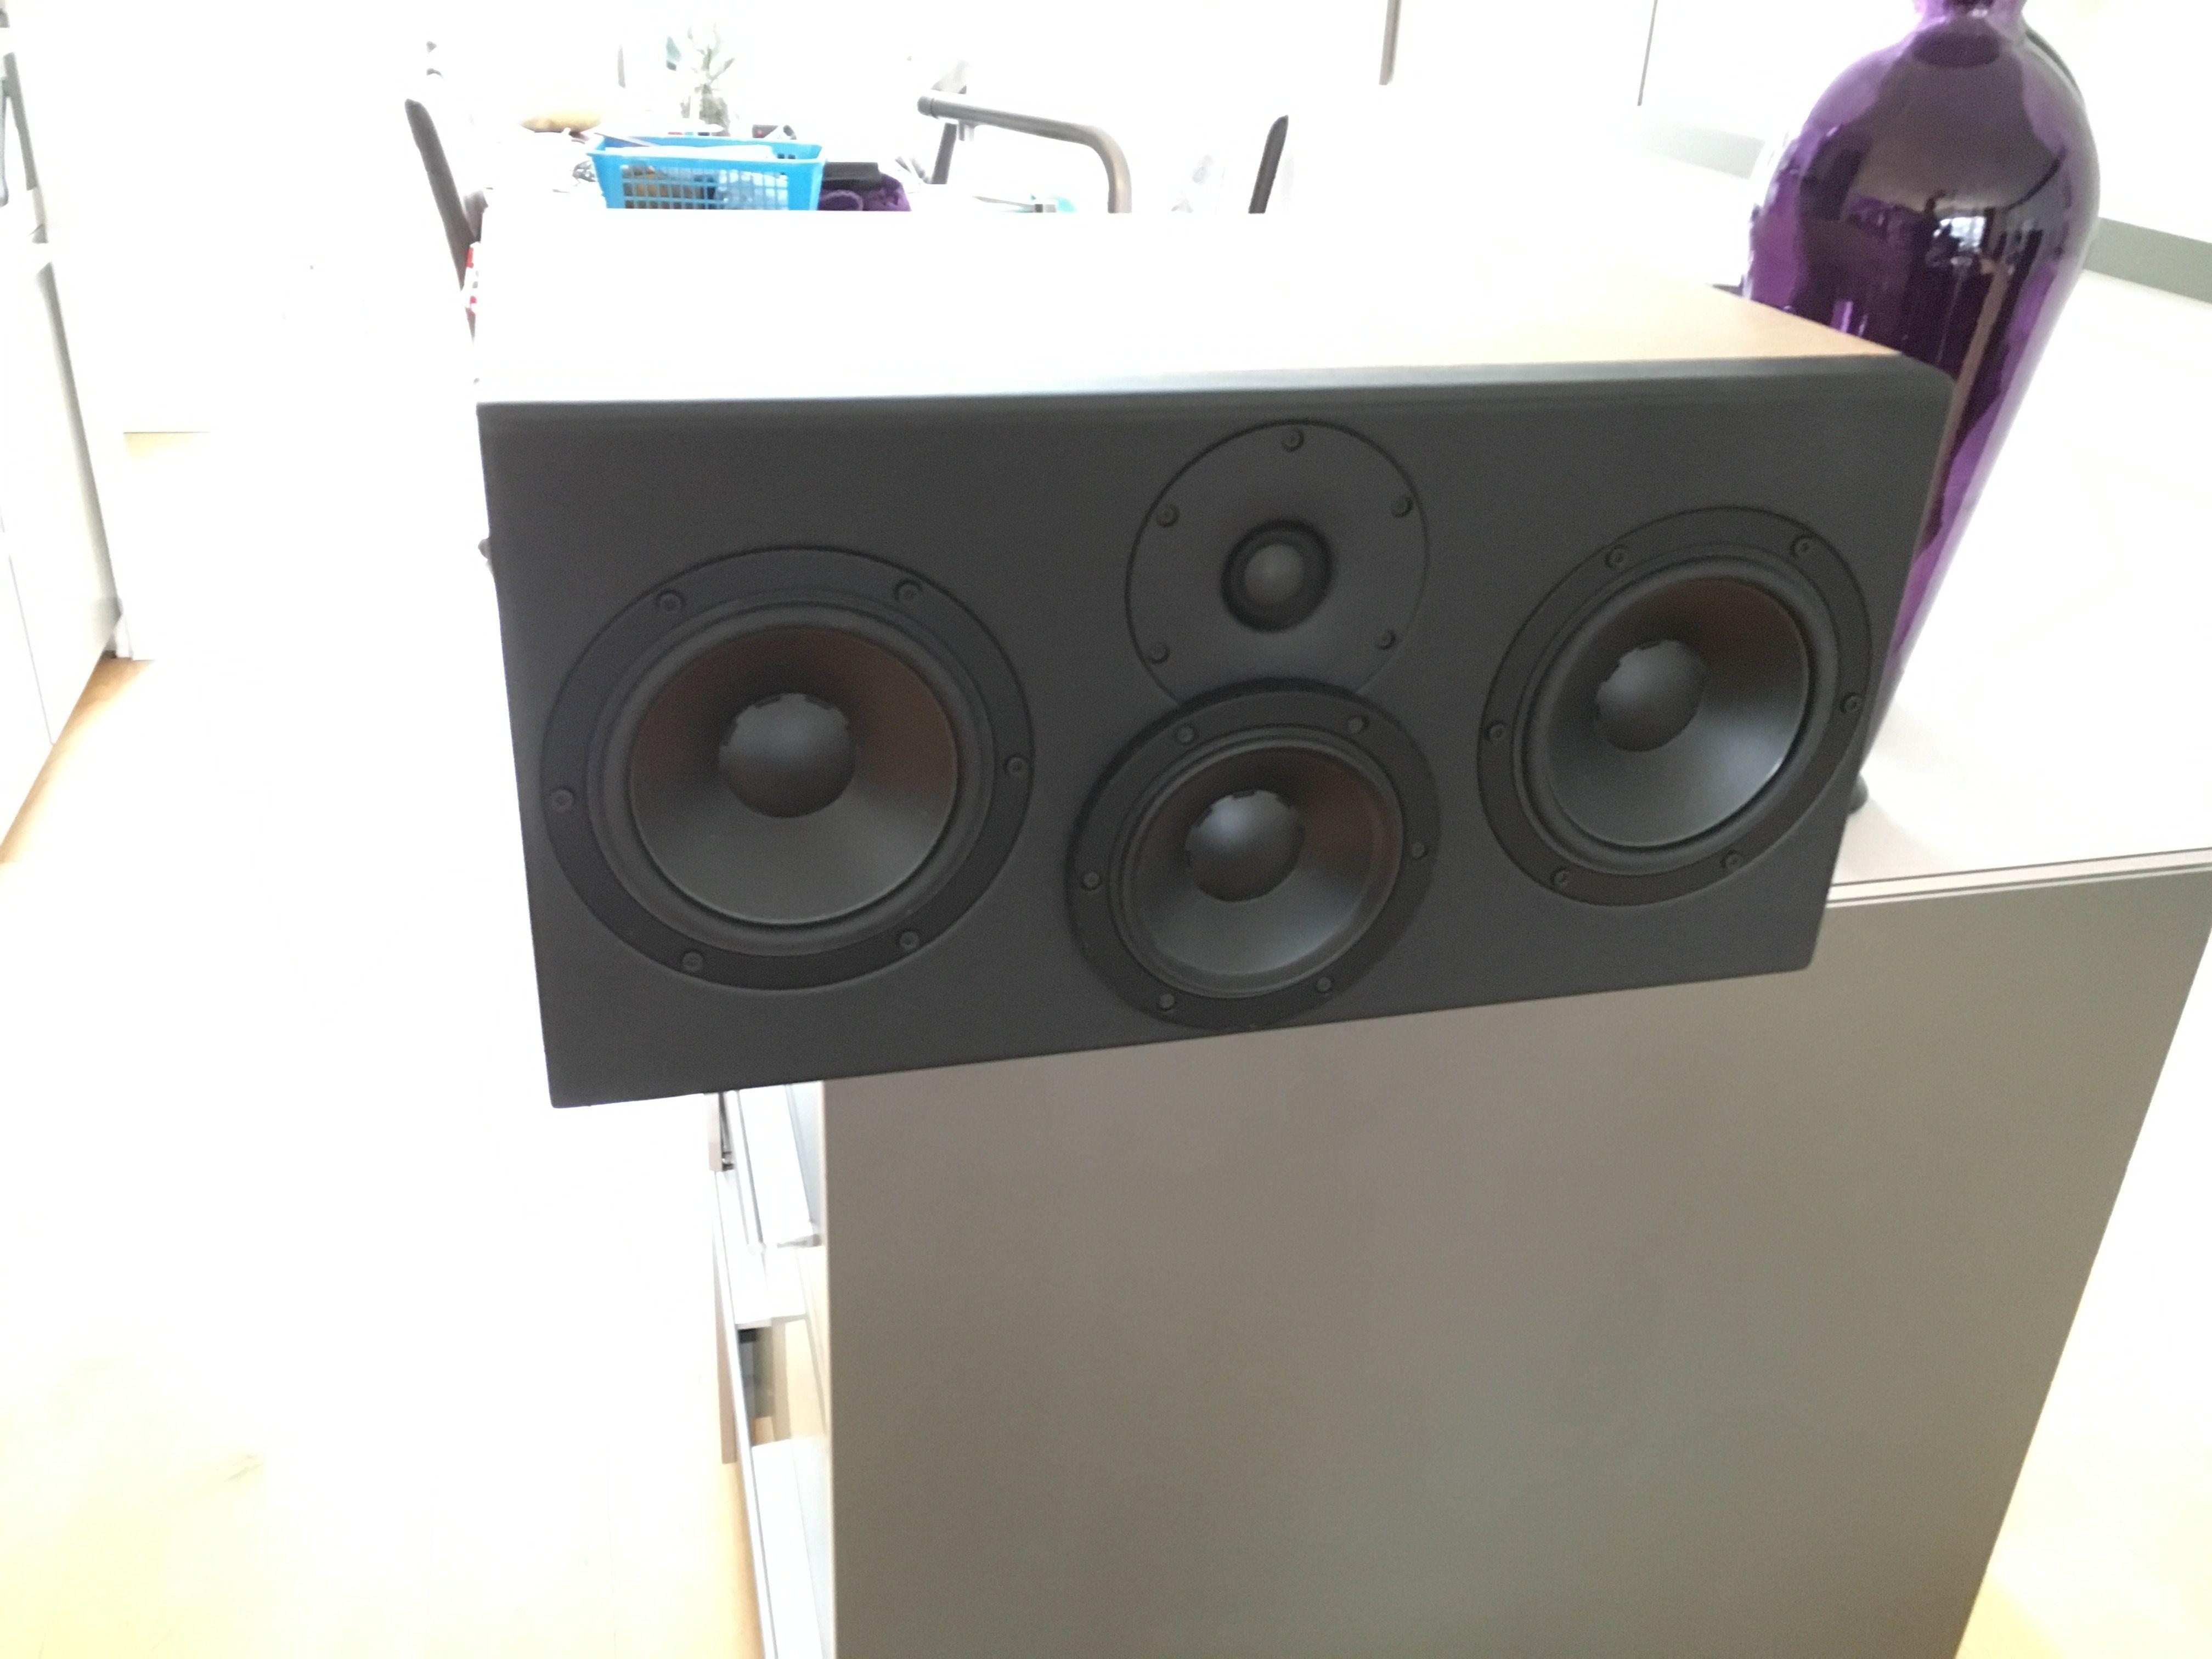 Pin by Rojponthamon Surinpath on HS6EQD | Diy speakers, Audiophile, DIY